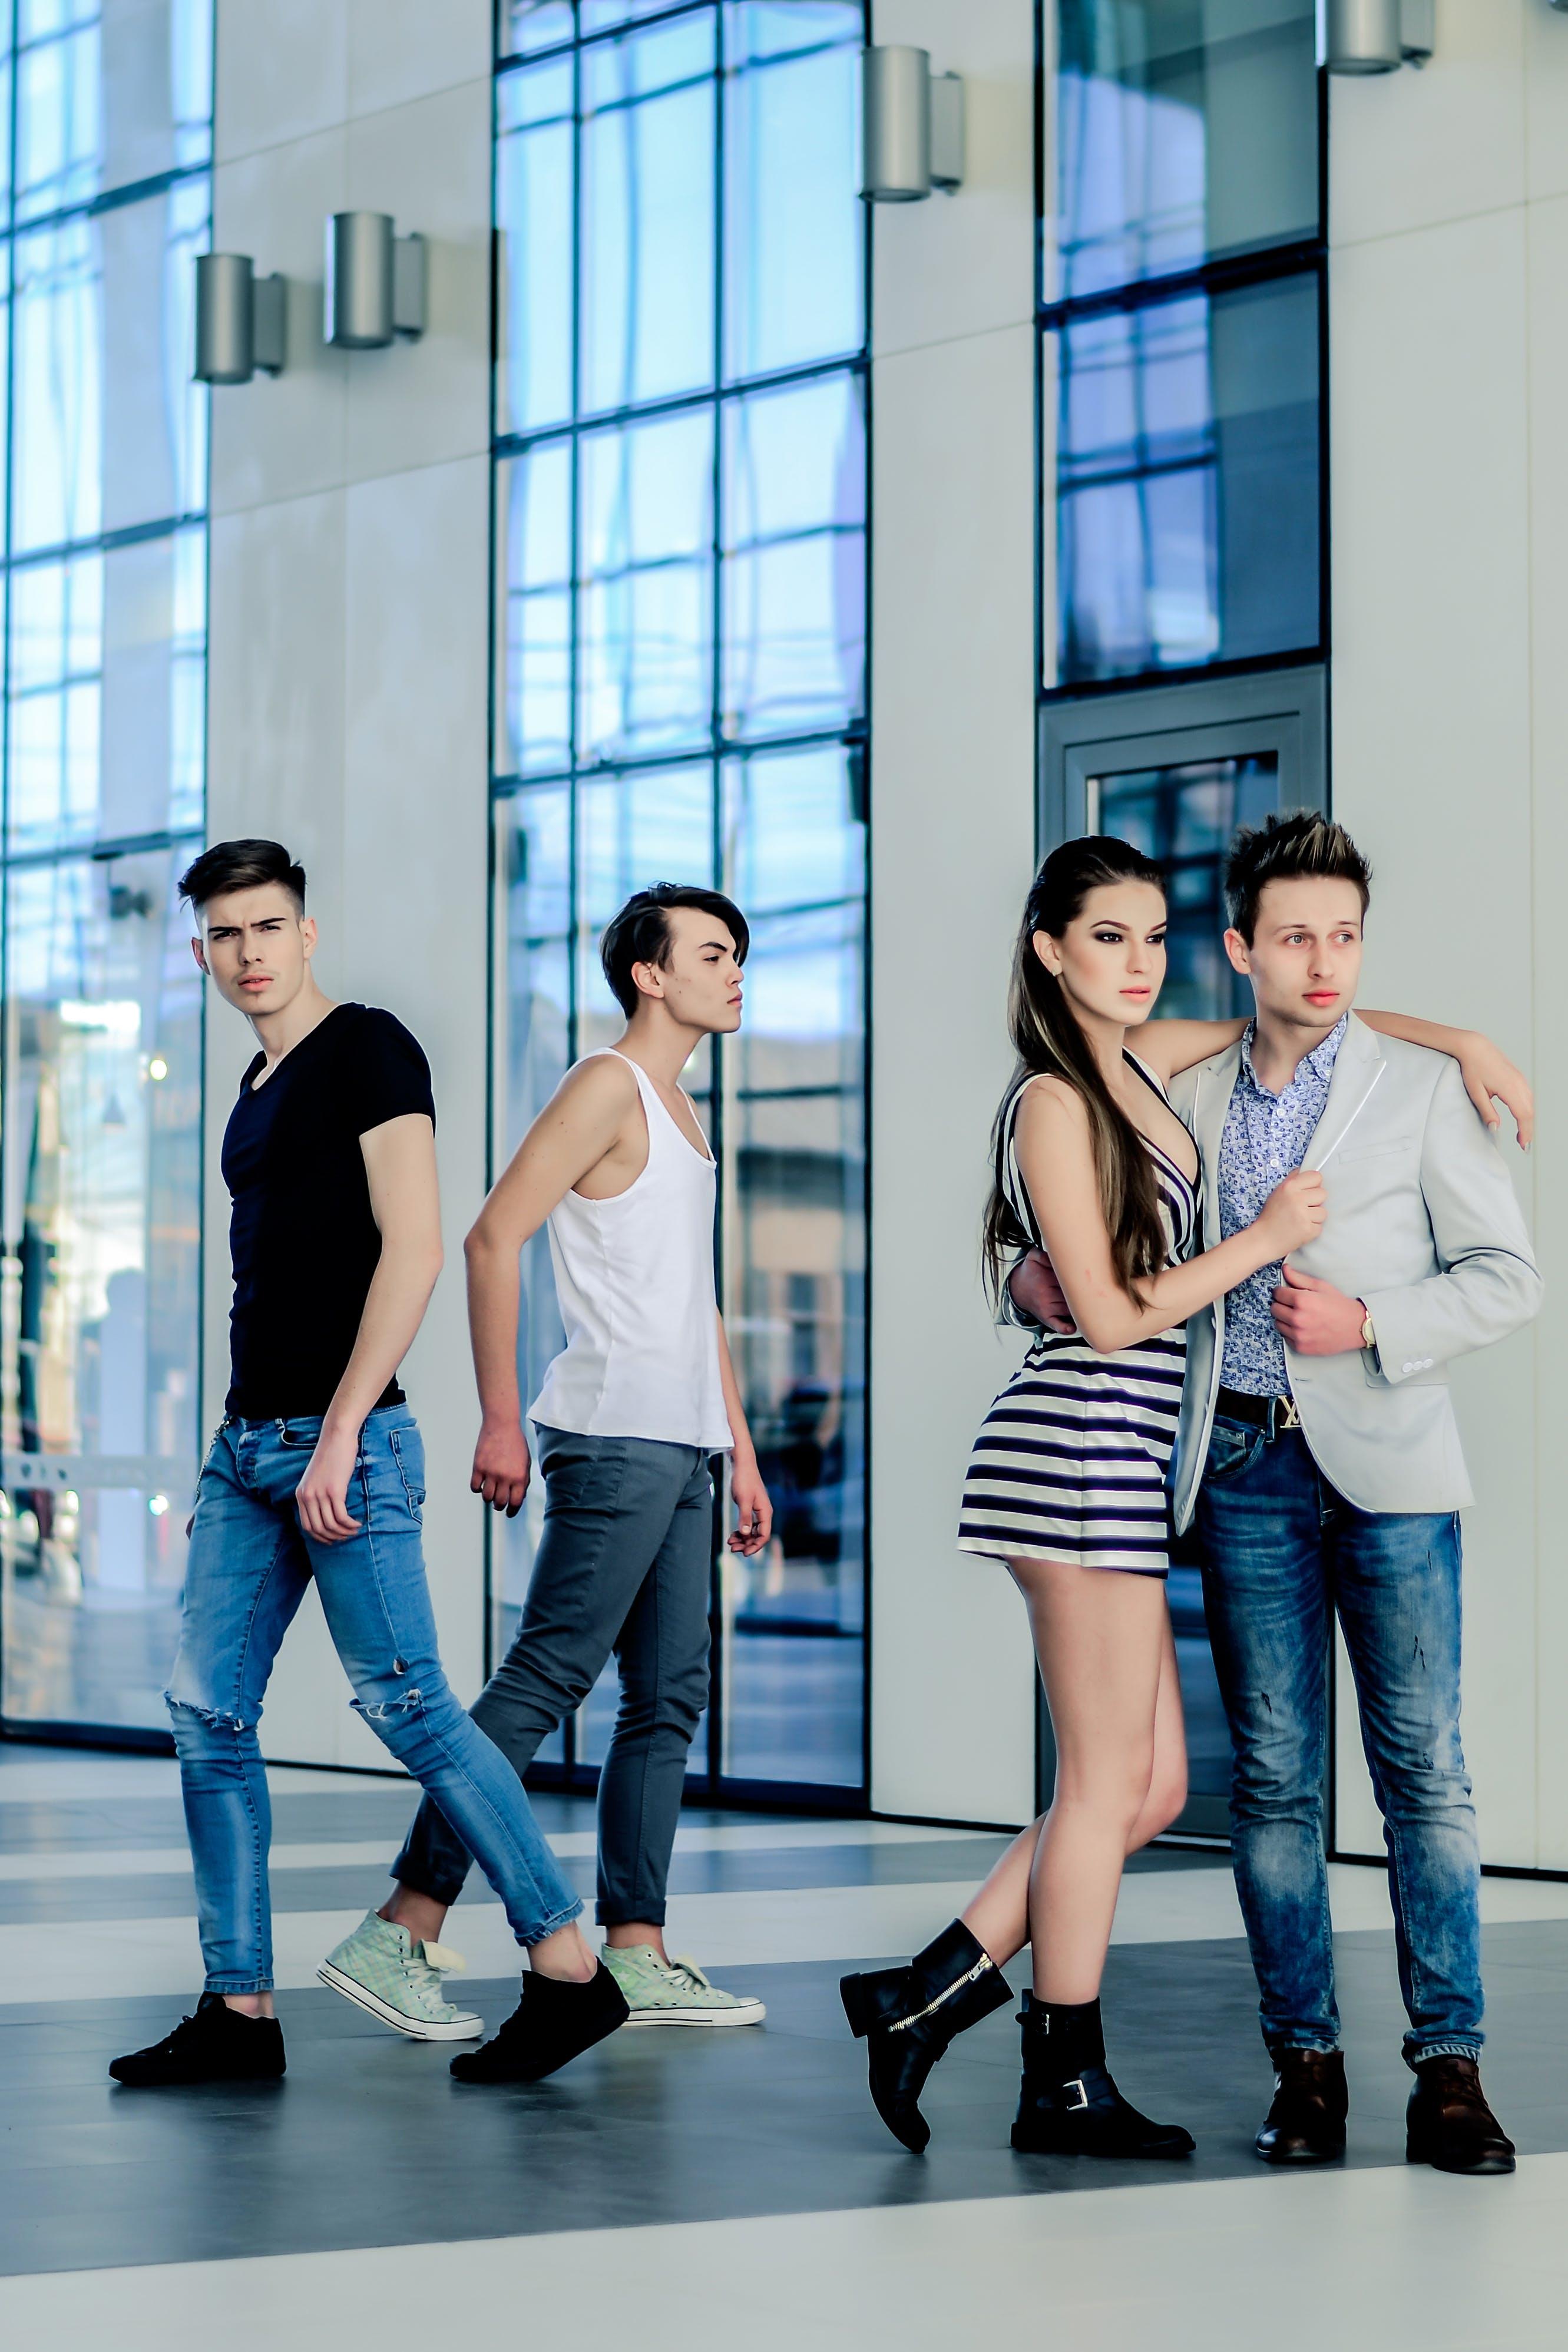 Models Posing